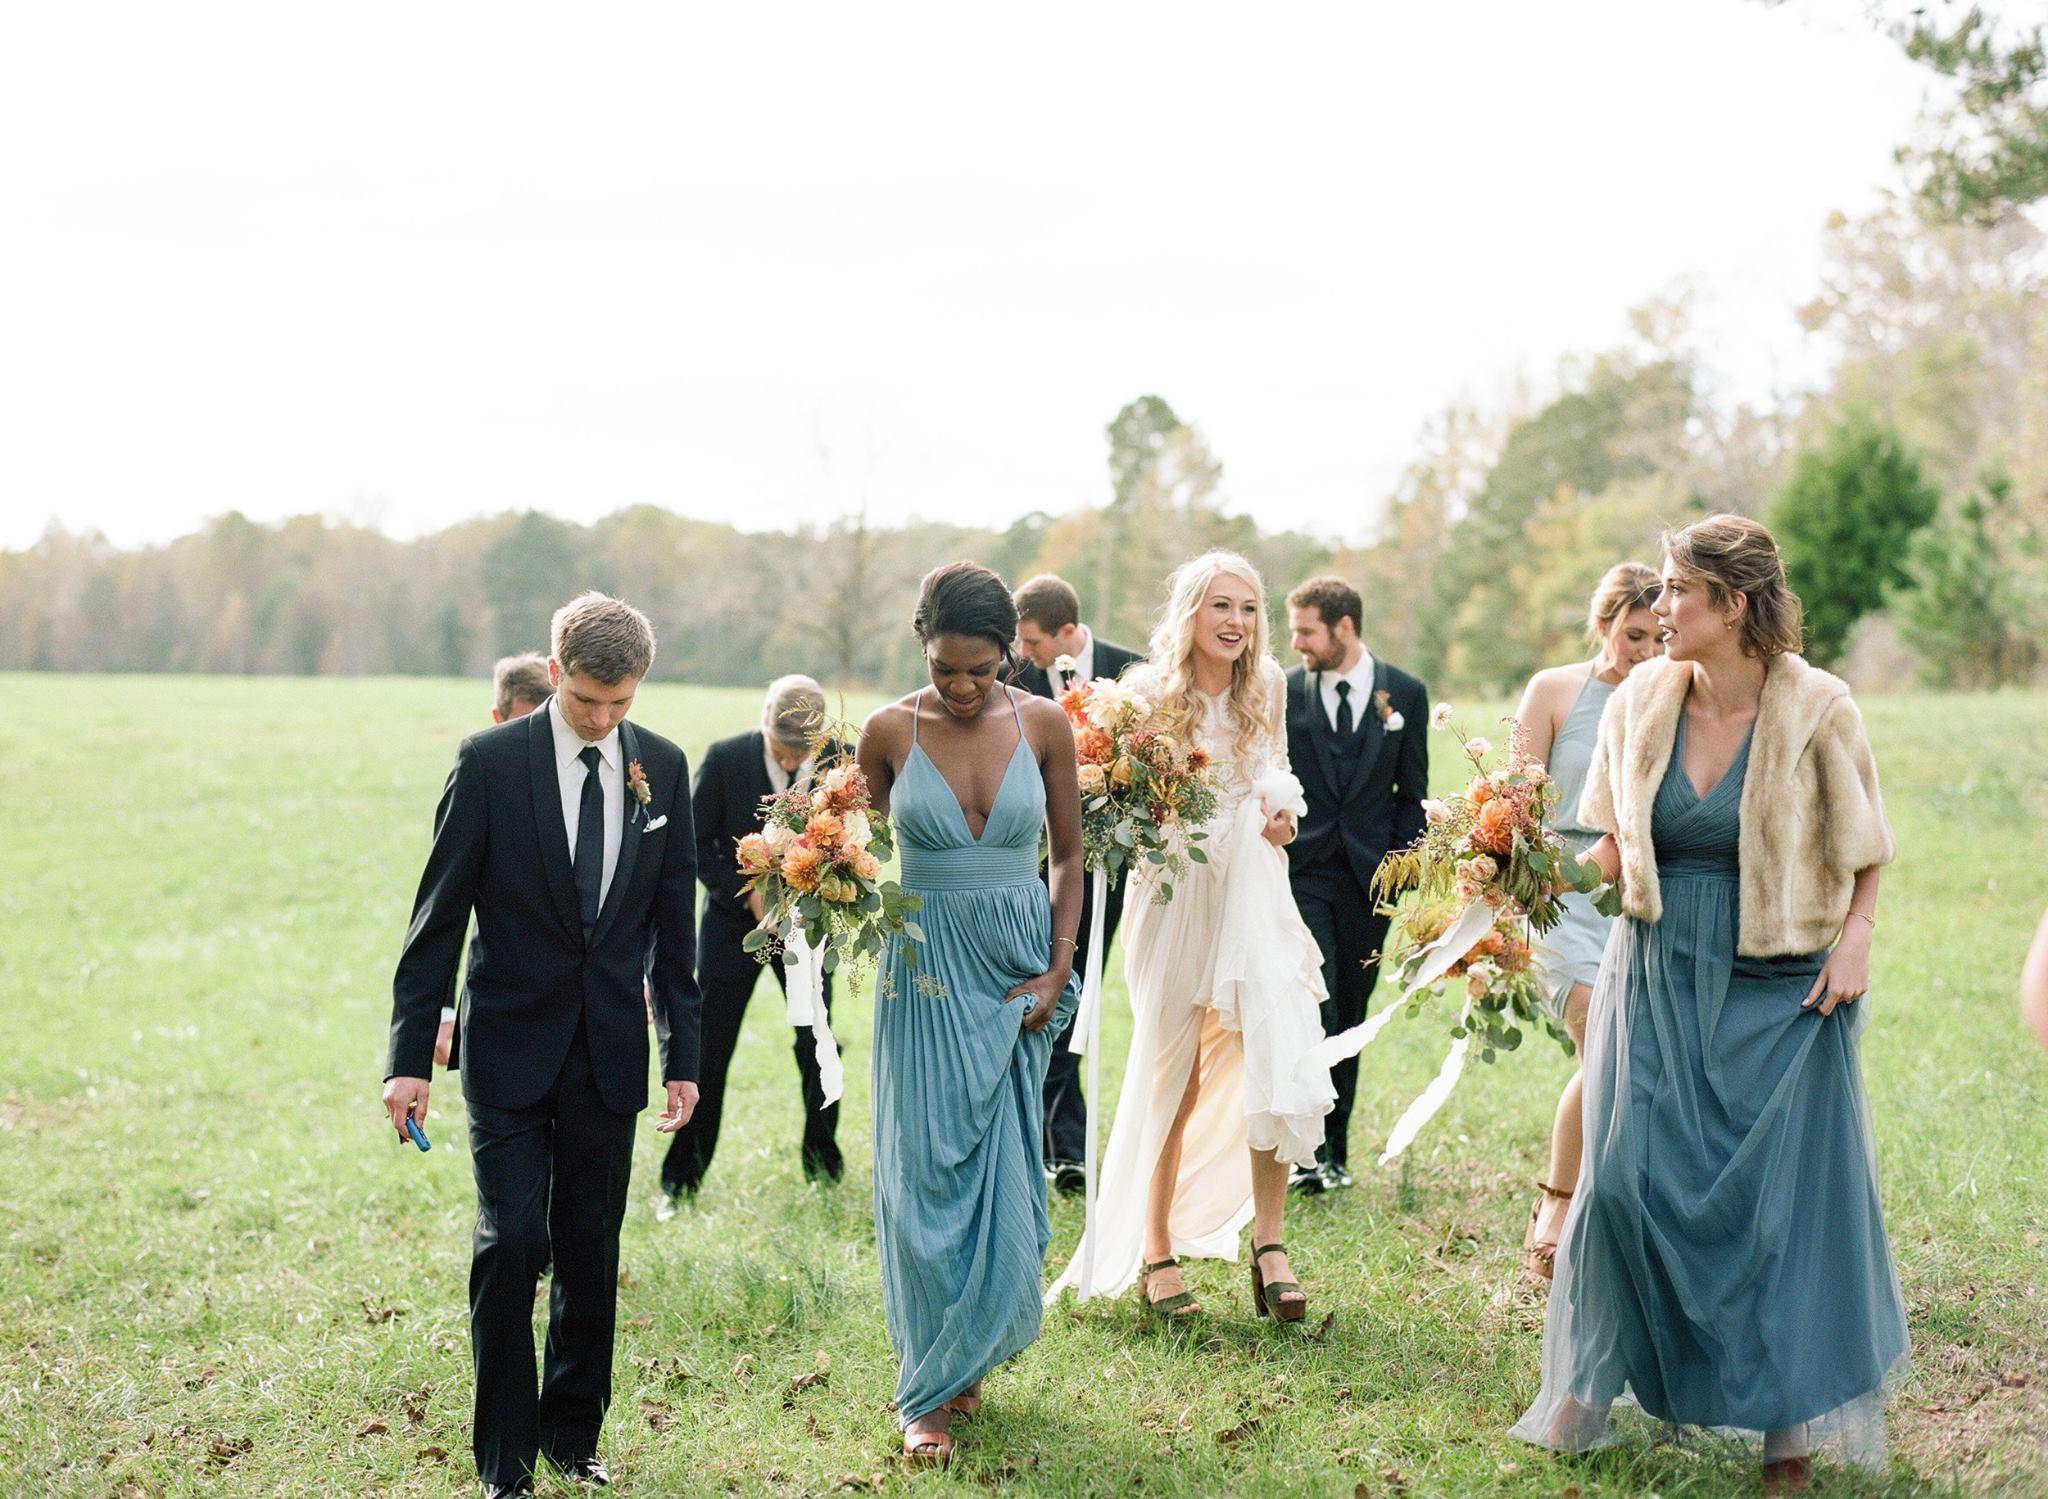 birmingham wedding florist planner